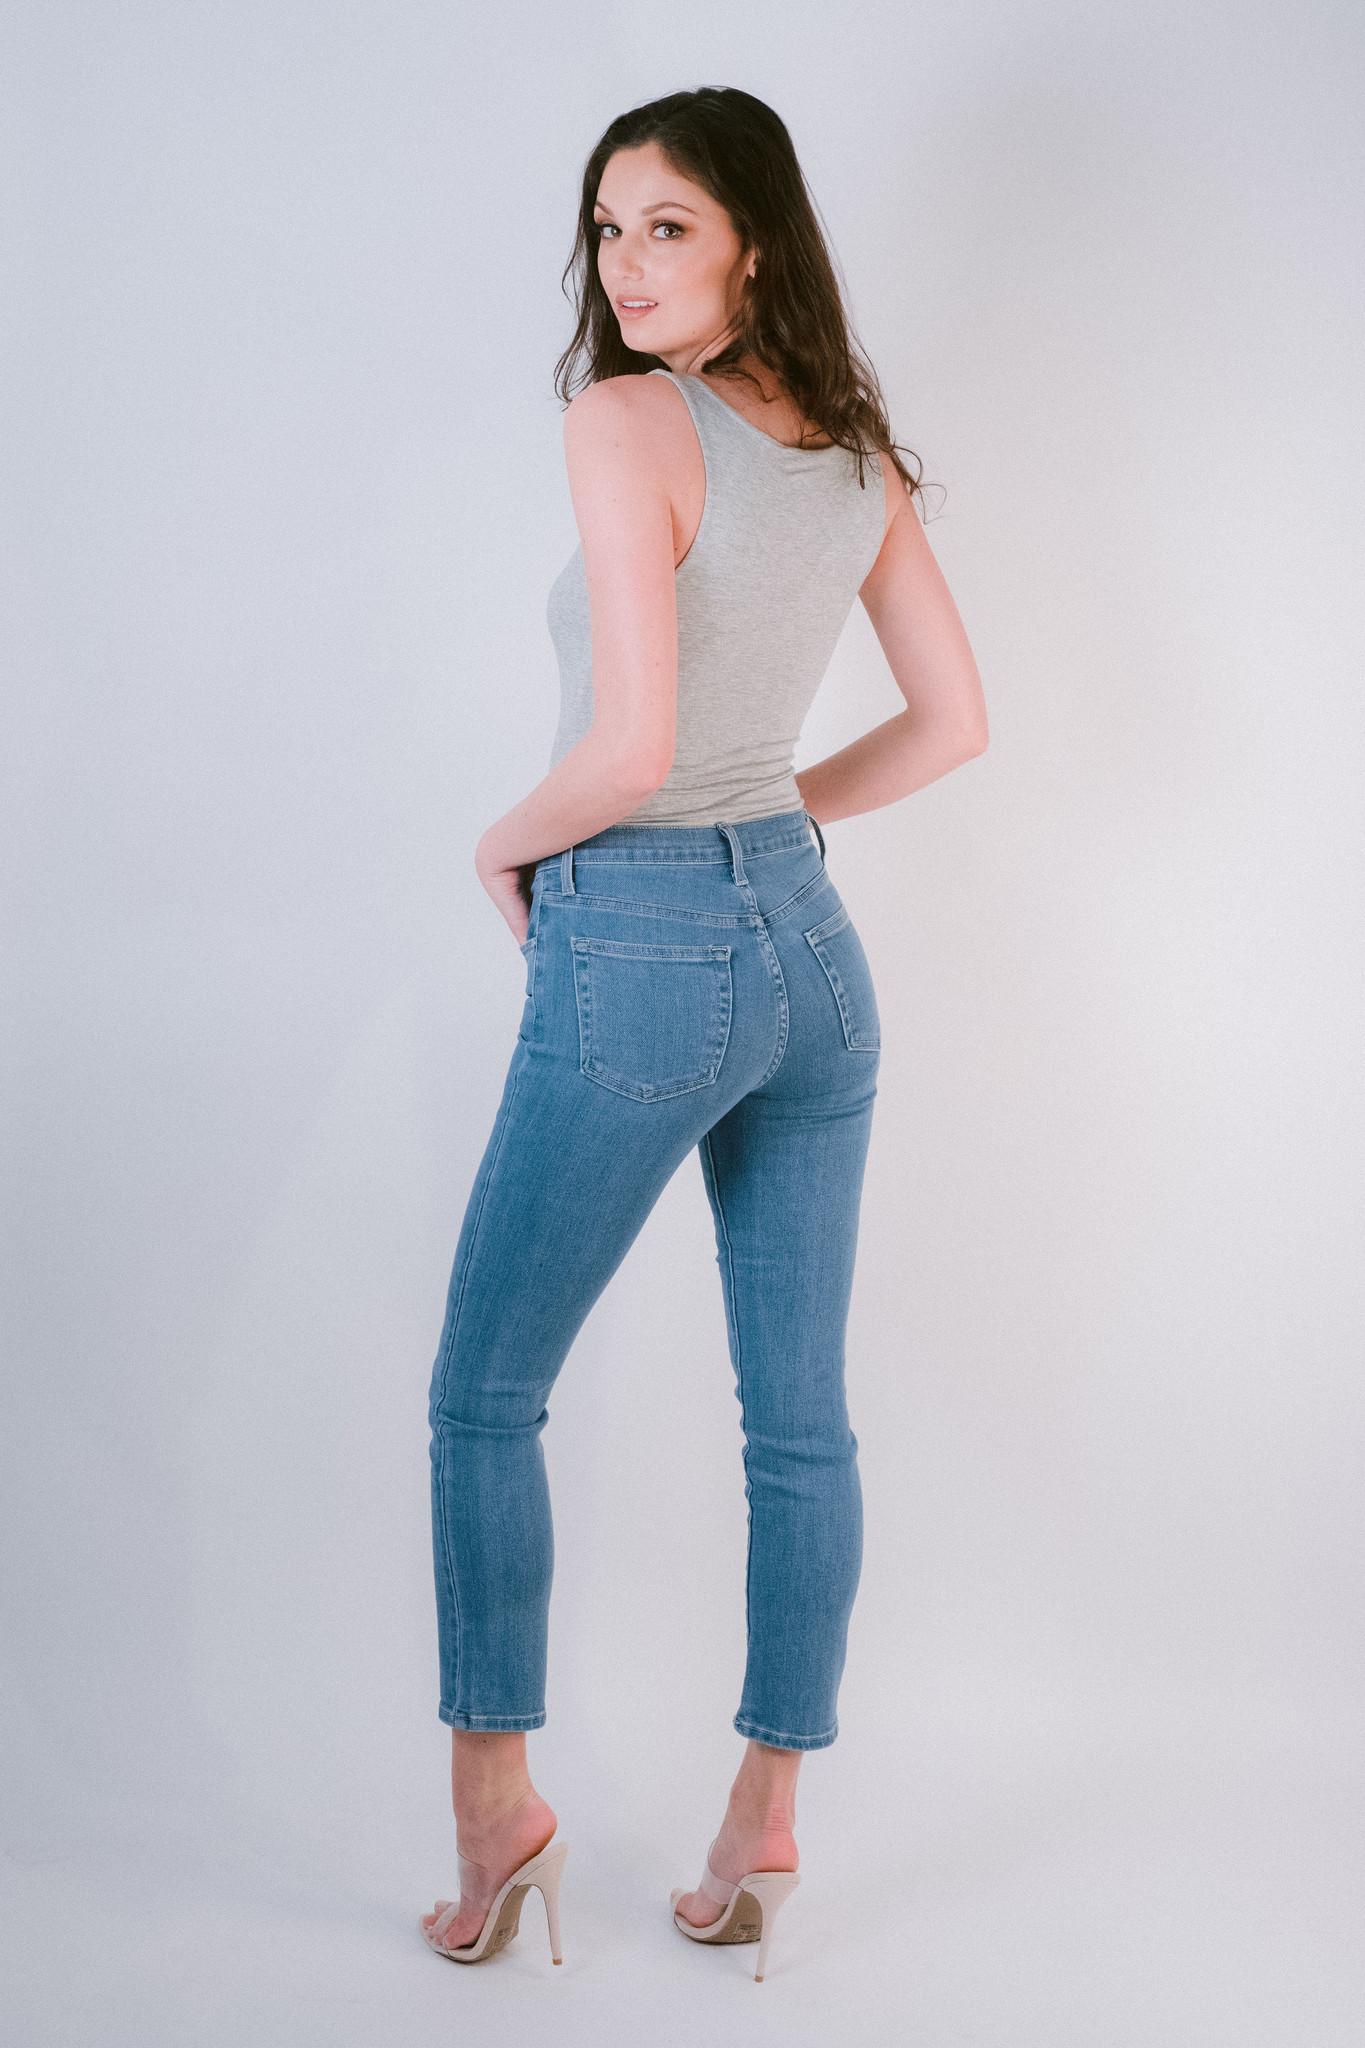 Jeans High Rise Cigarette Jeans